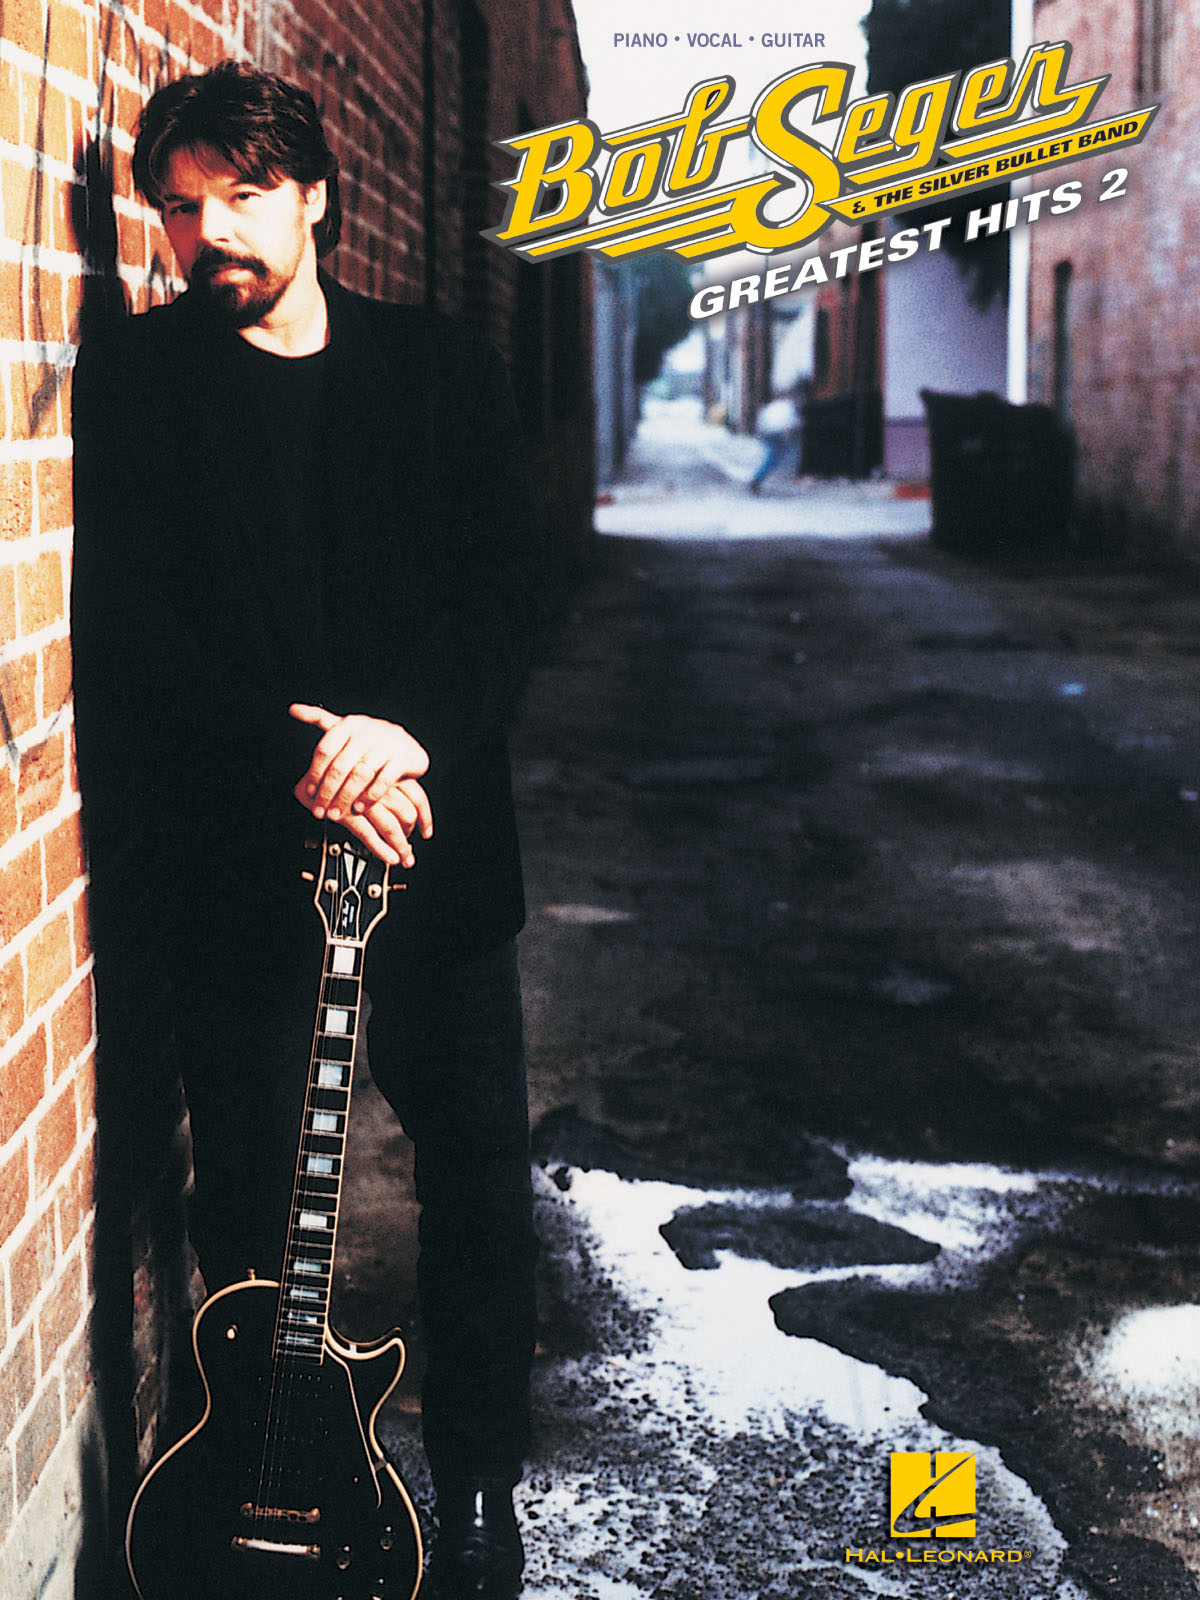 Bob Seger: Bob Seger - Greatest Hits 2: Piano  Vocal and Guitar: Vocal Album